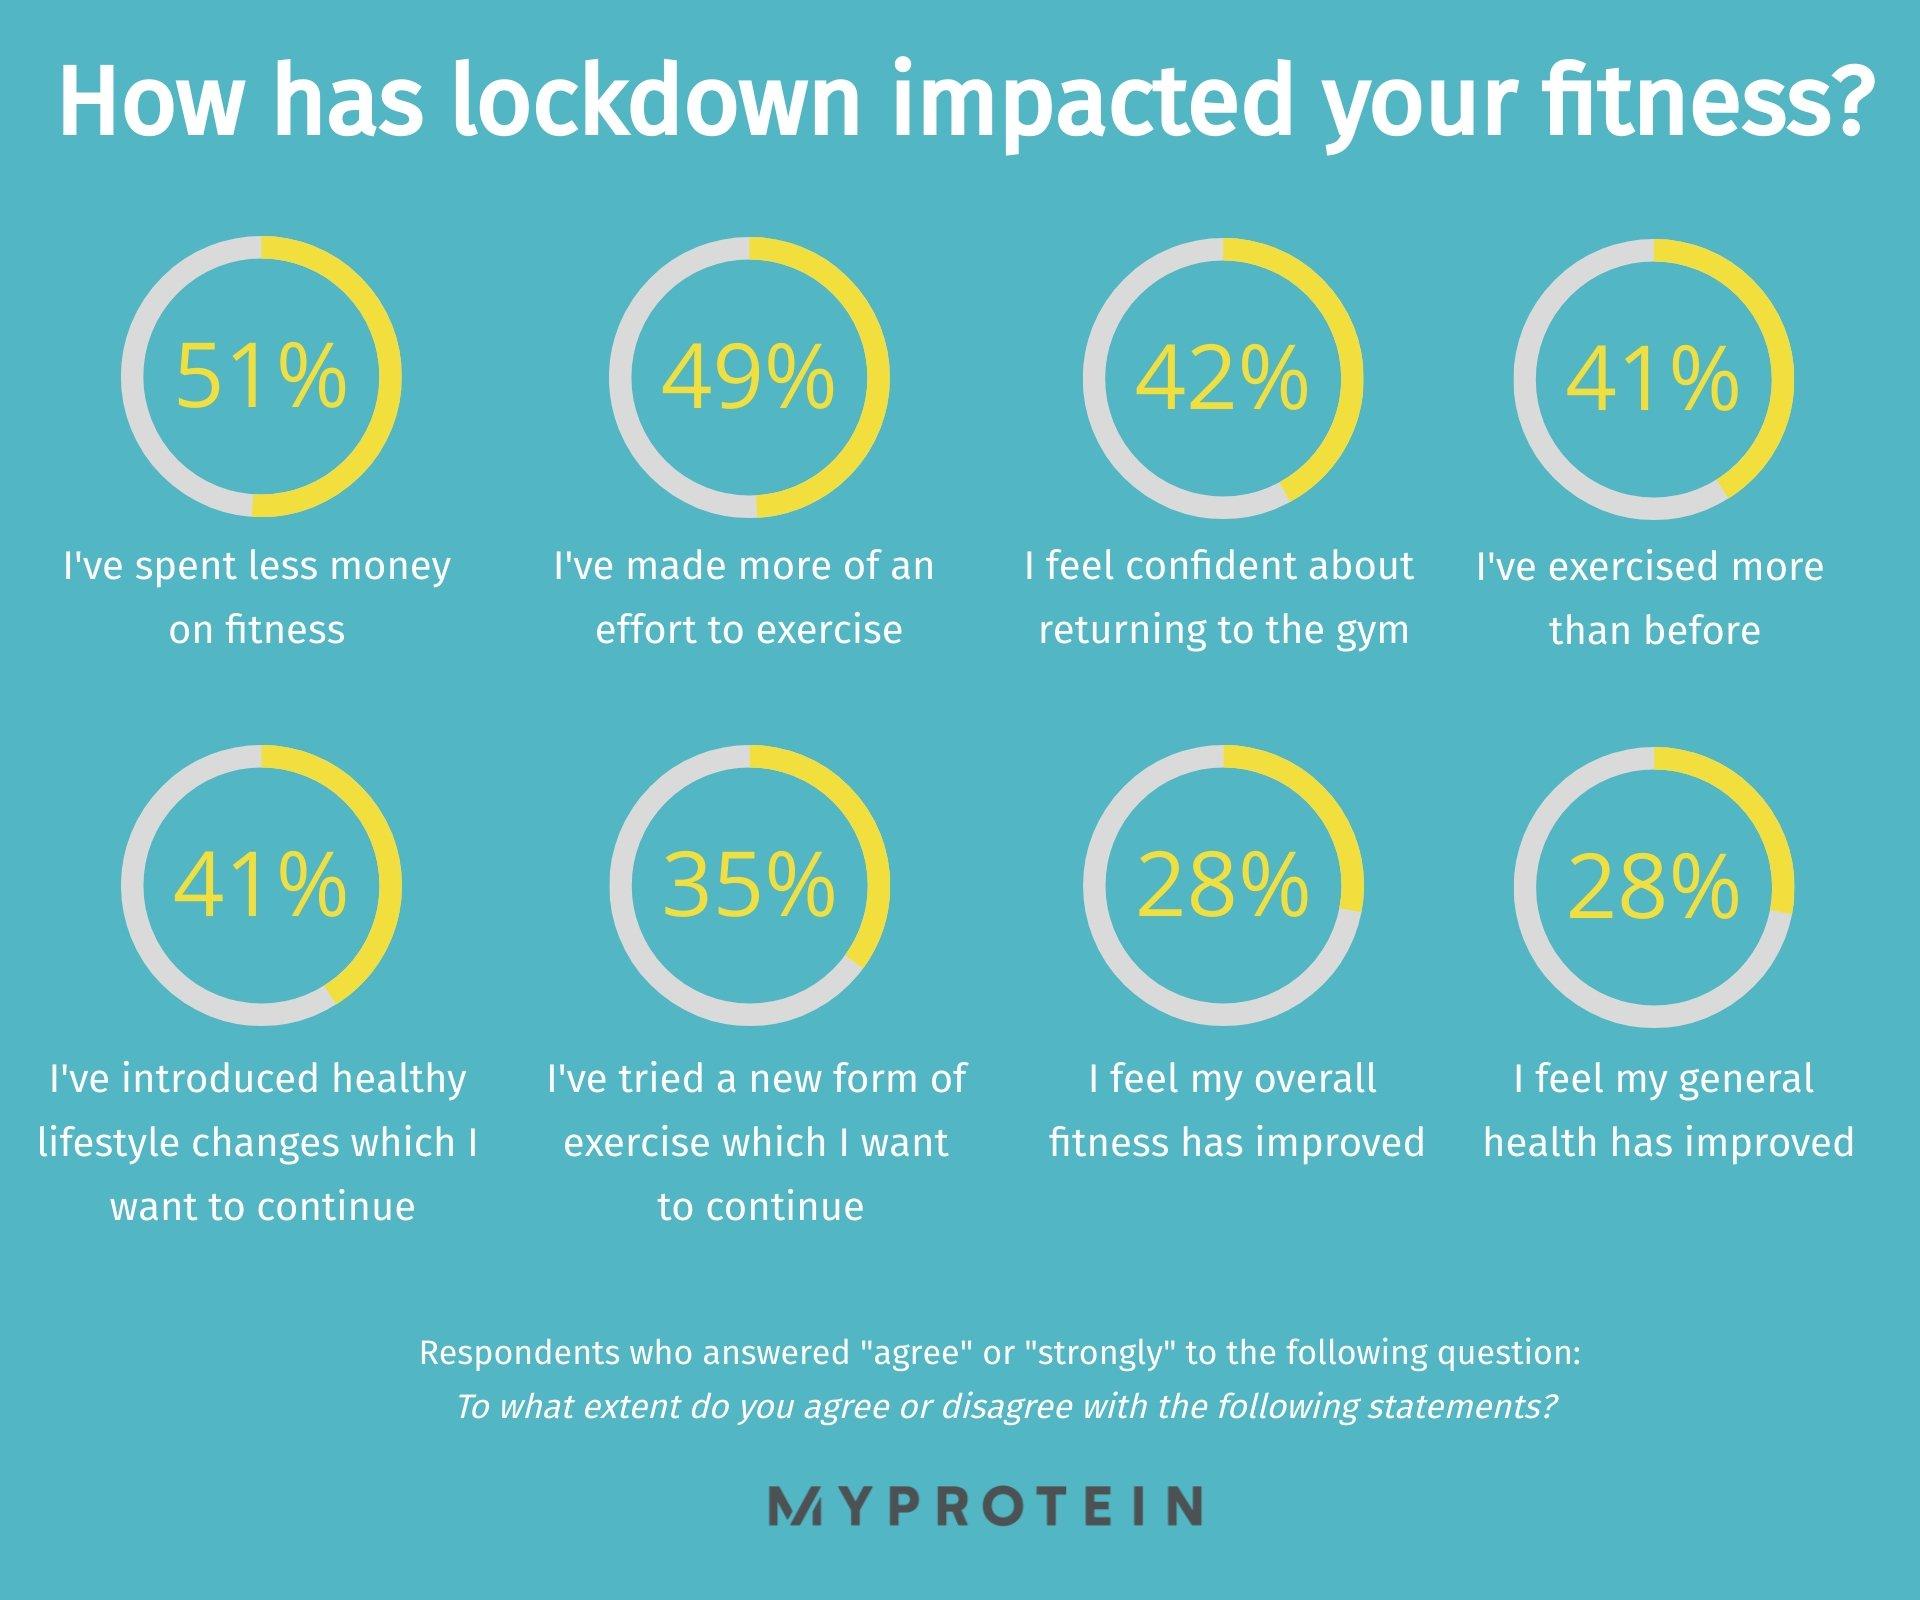 Lockdown impact on fitness UK